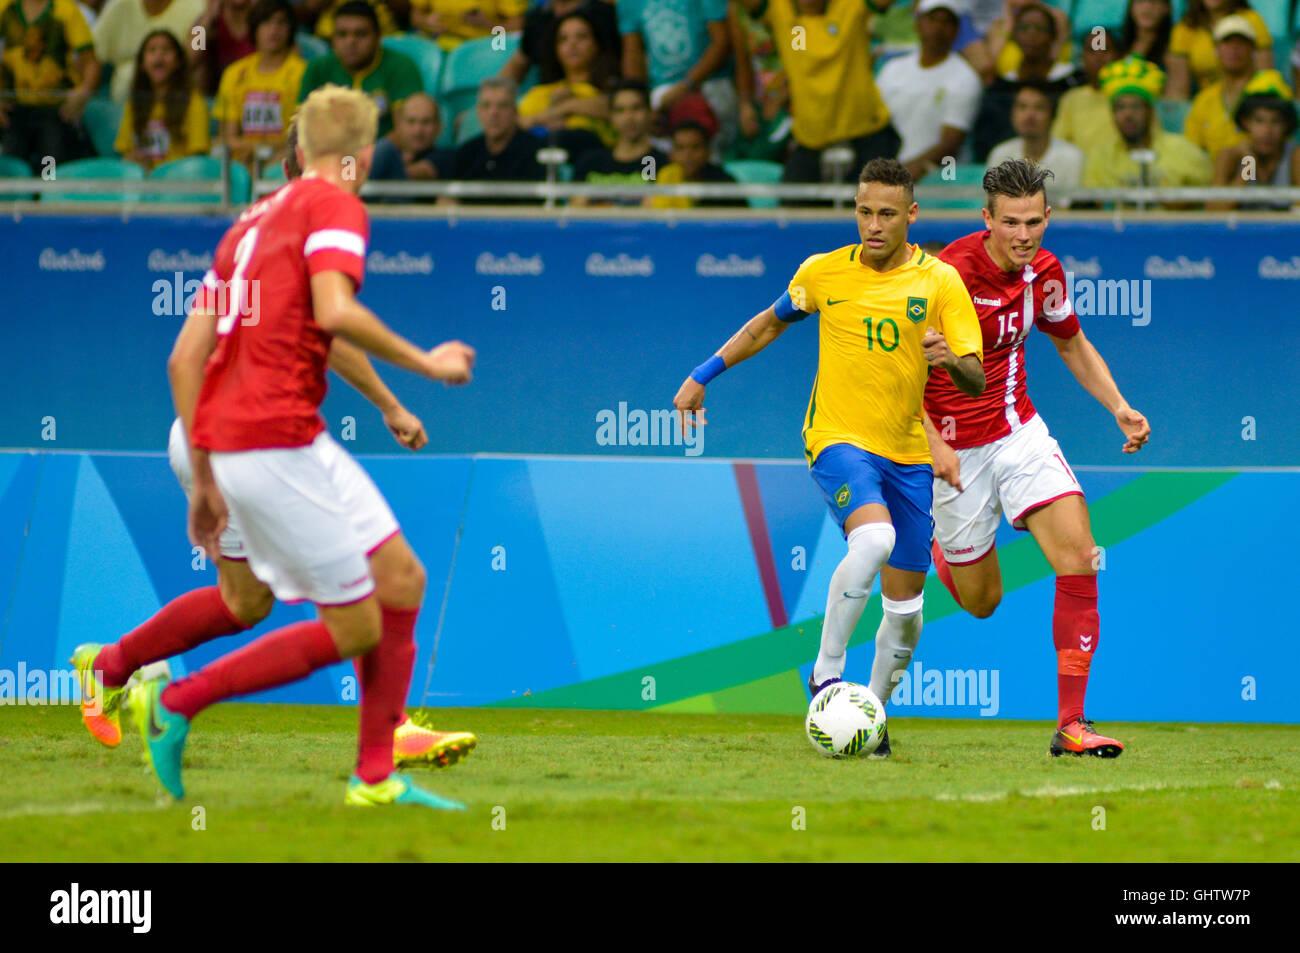 Salvador, Brazil. 10th August, 2016. OLYMPICS 2016 FOOTBALL SALVADOR - Neymar bid dispute in the match between Brazil Stock Photo